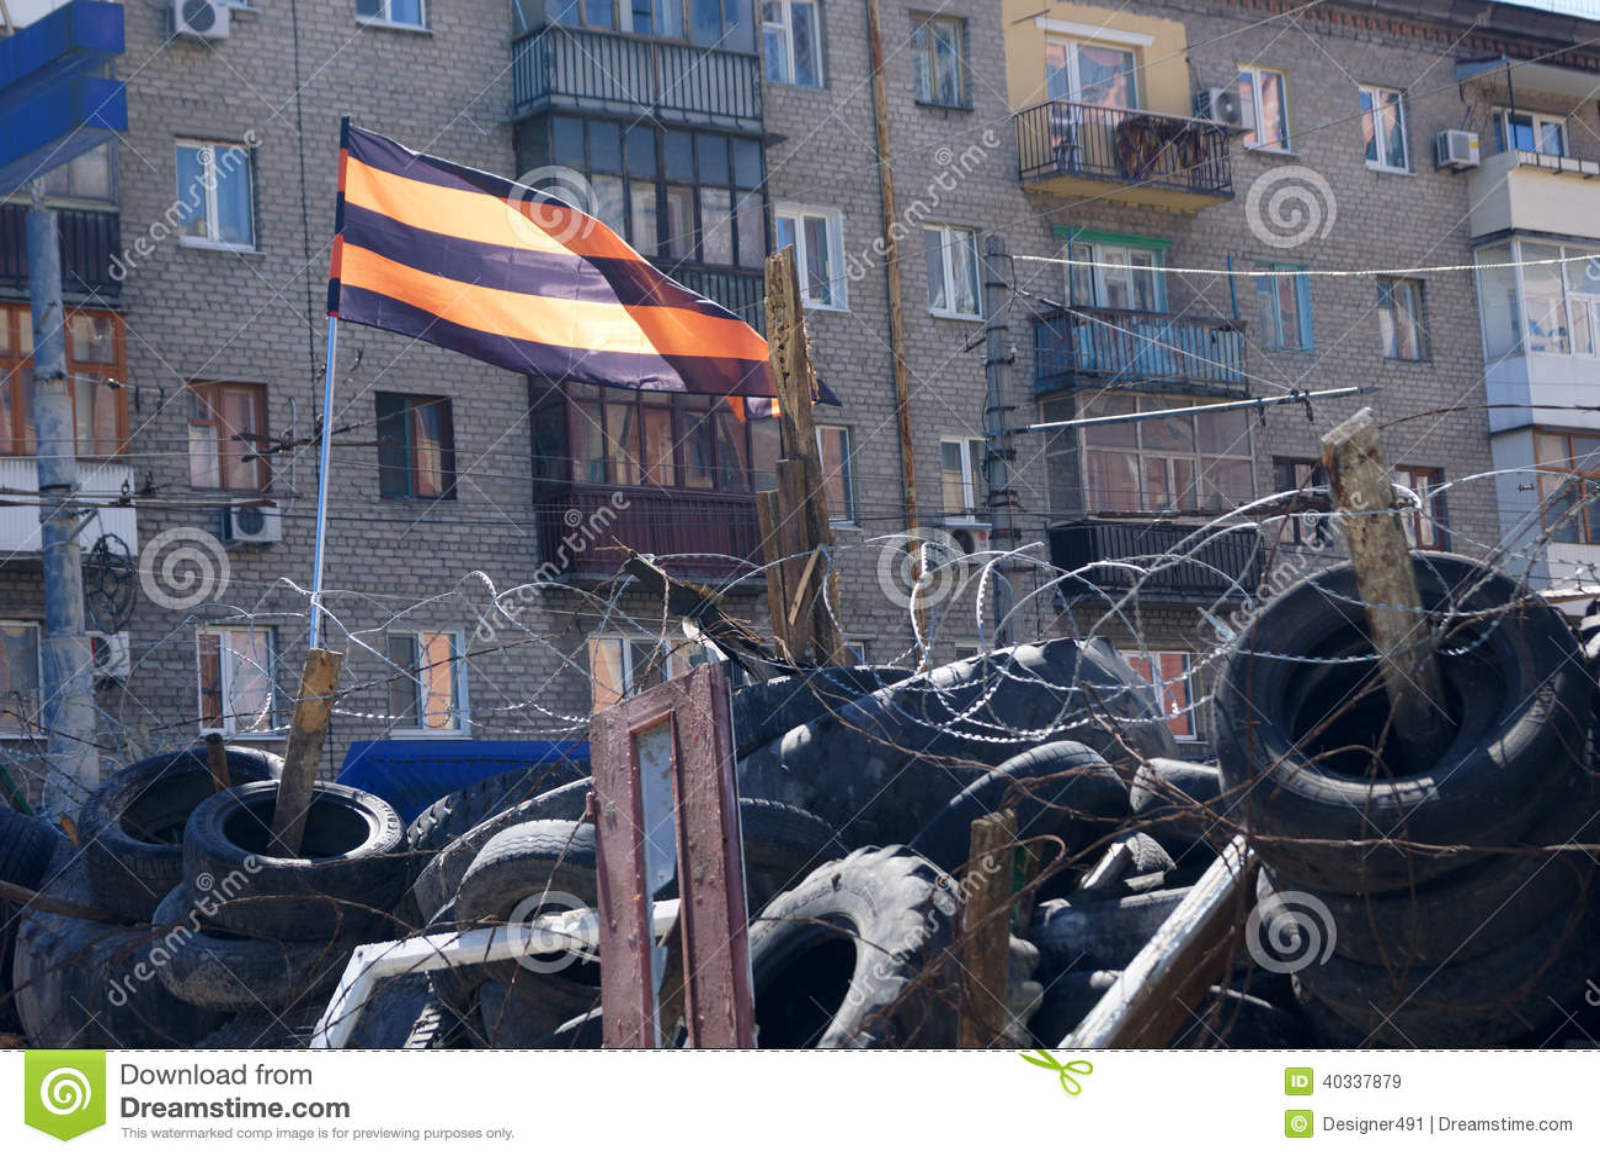 Pro-Russian separatist flag over the barricades. Lugansk, Ukraine